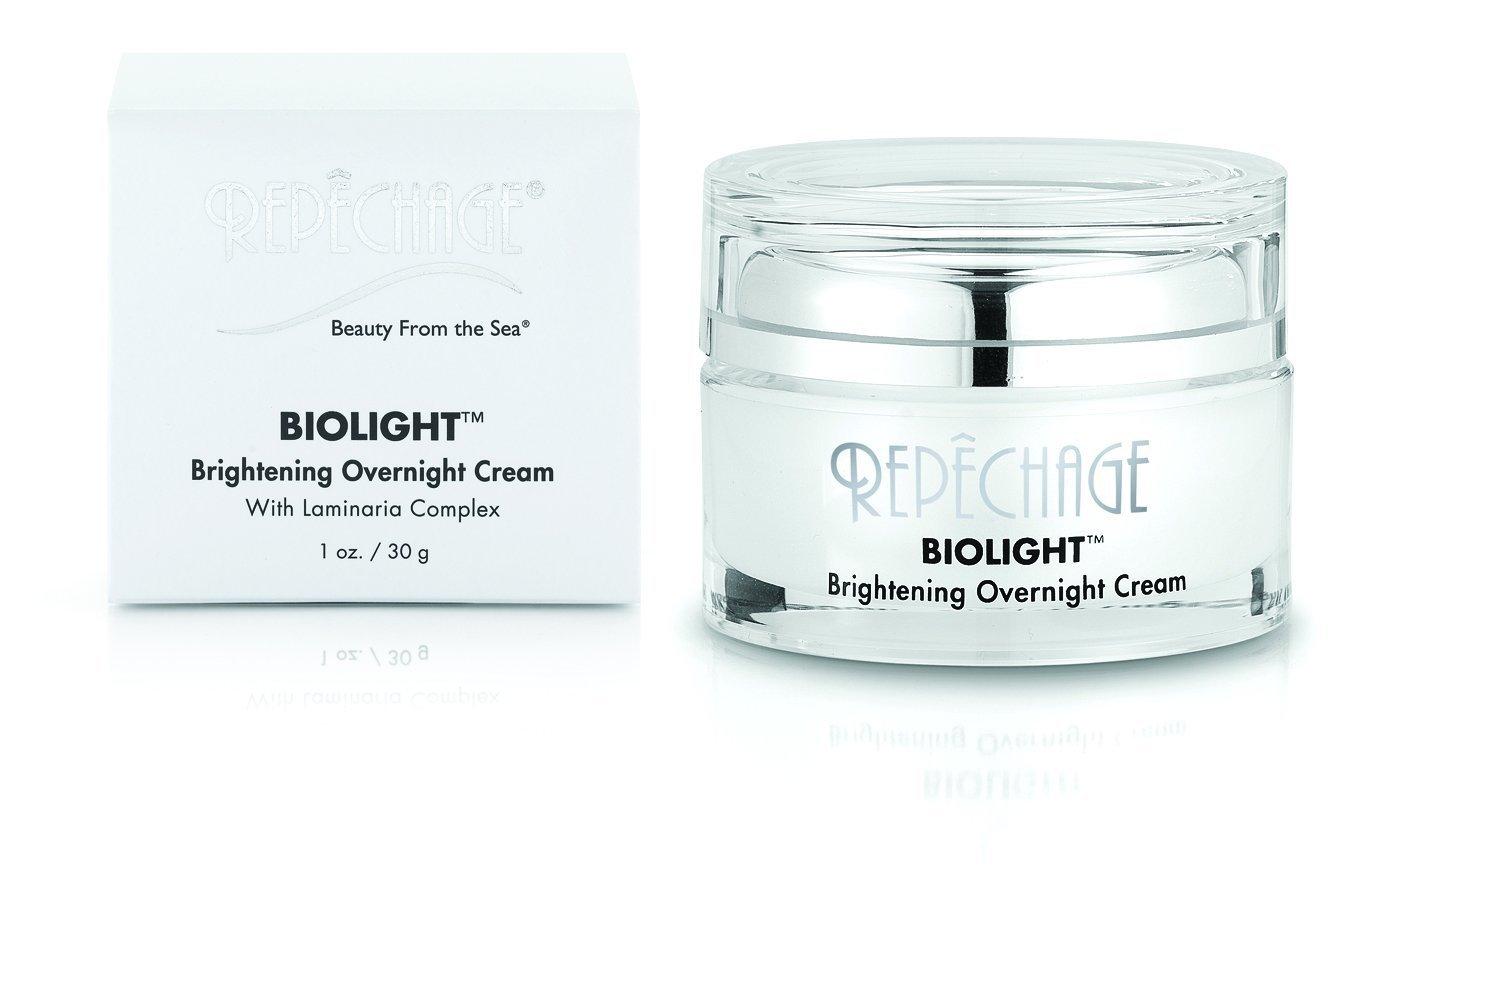 Amazon.com : Repechage Biolight Brightening Cleanser with